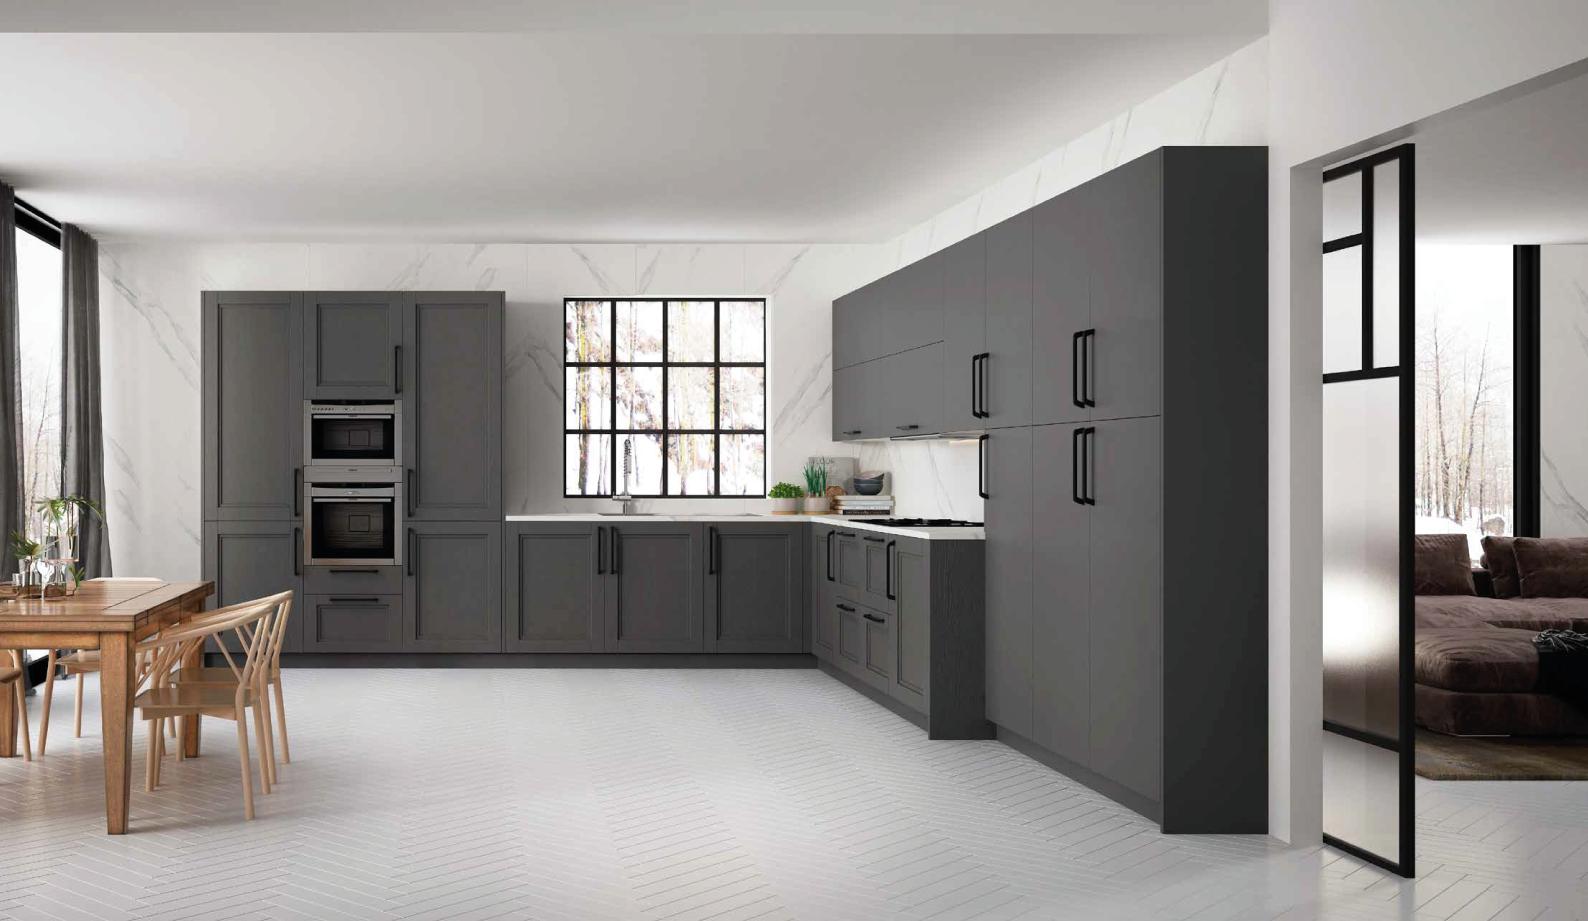 Cozinha moderna cinzenta